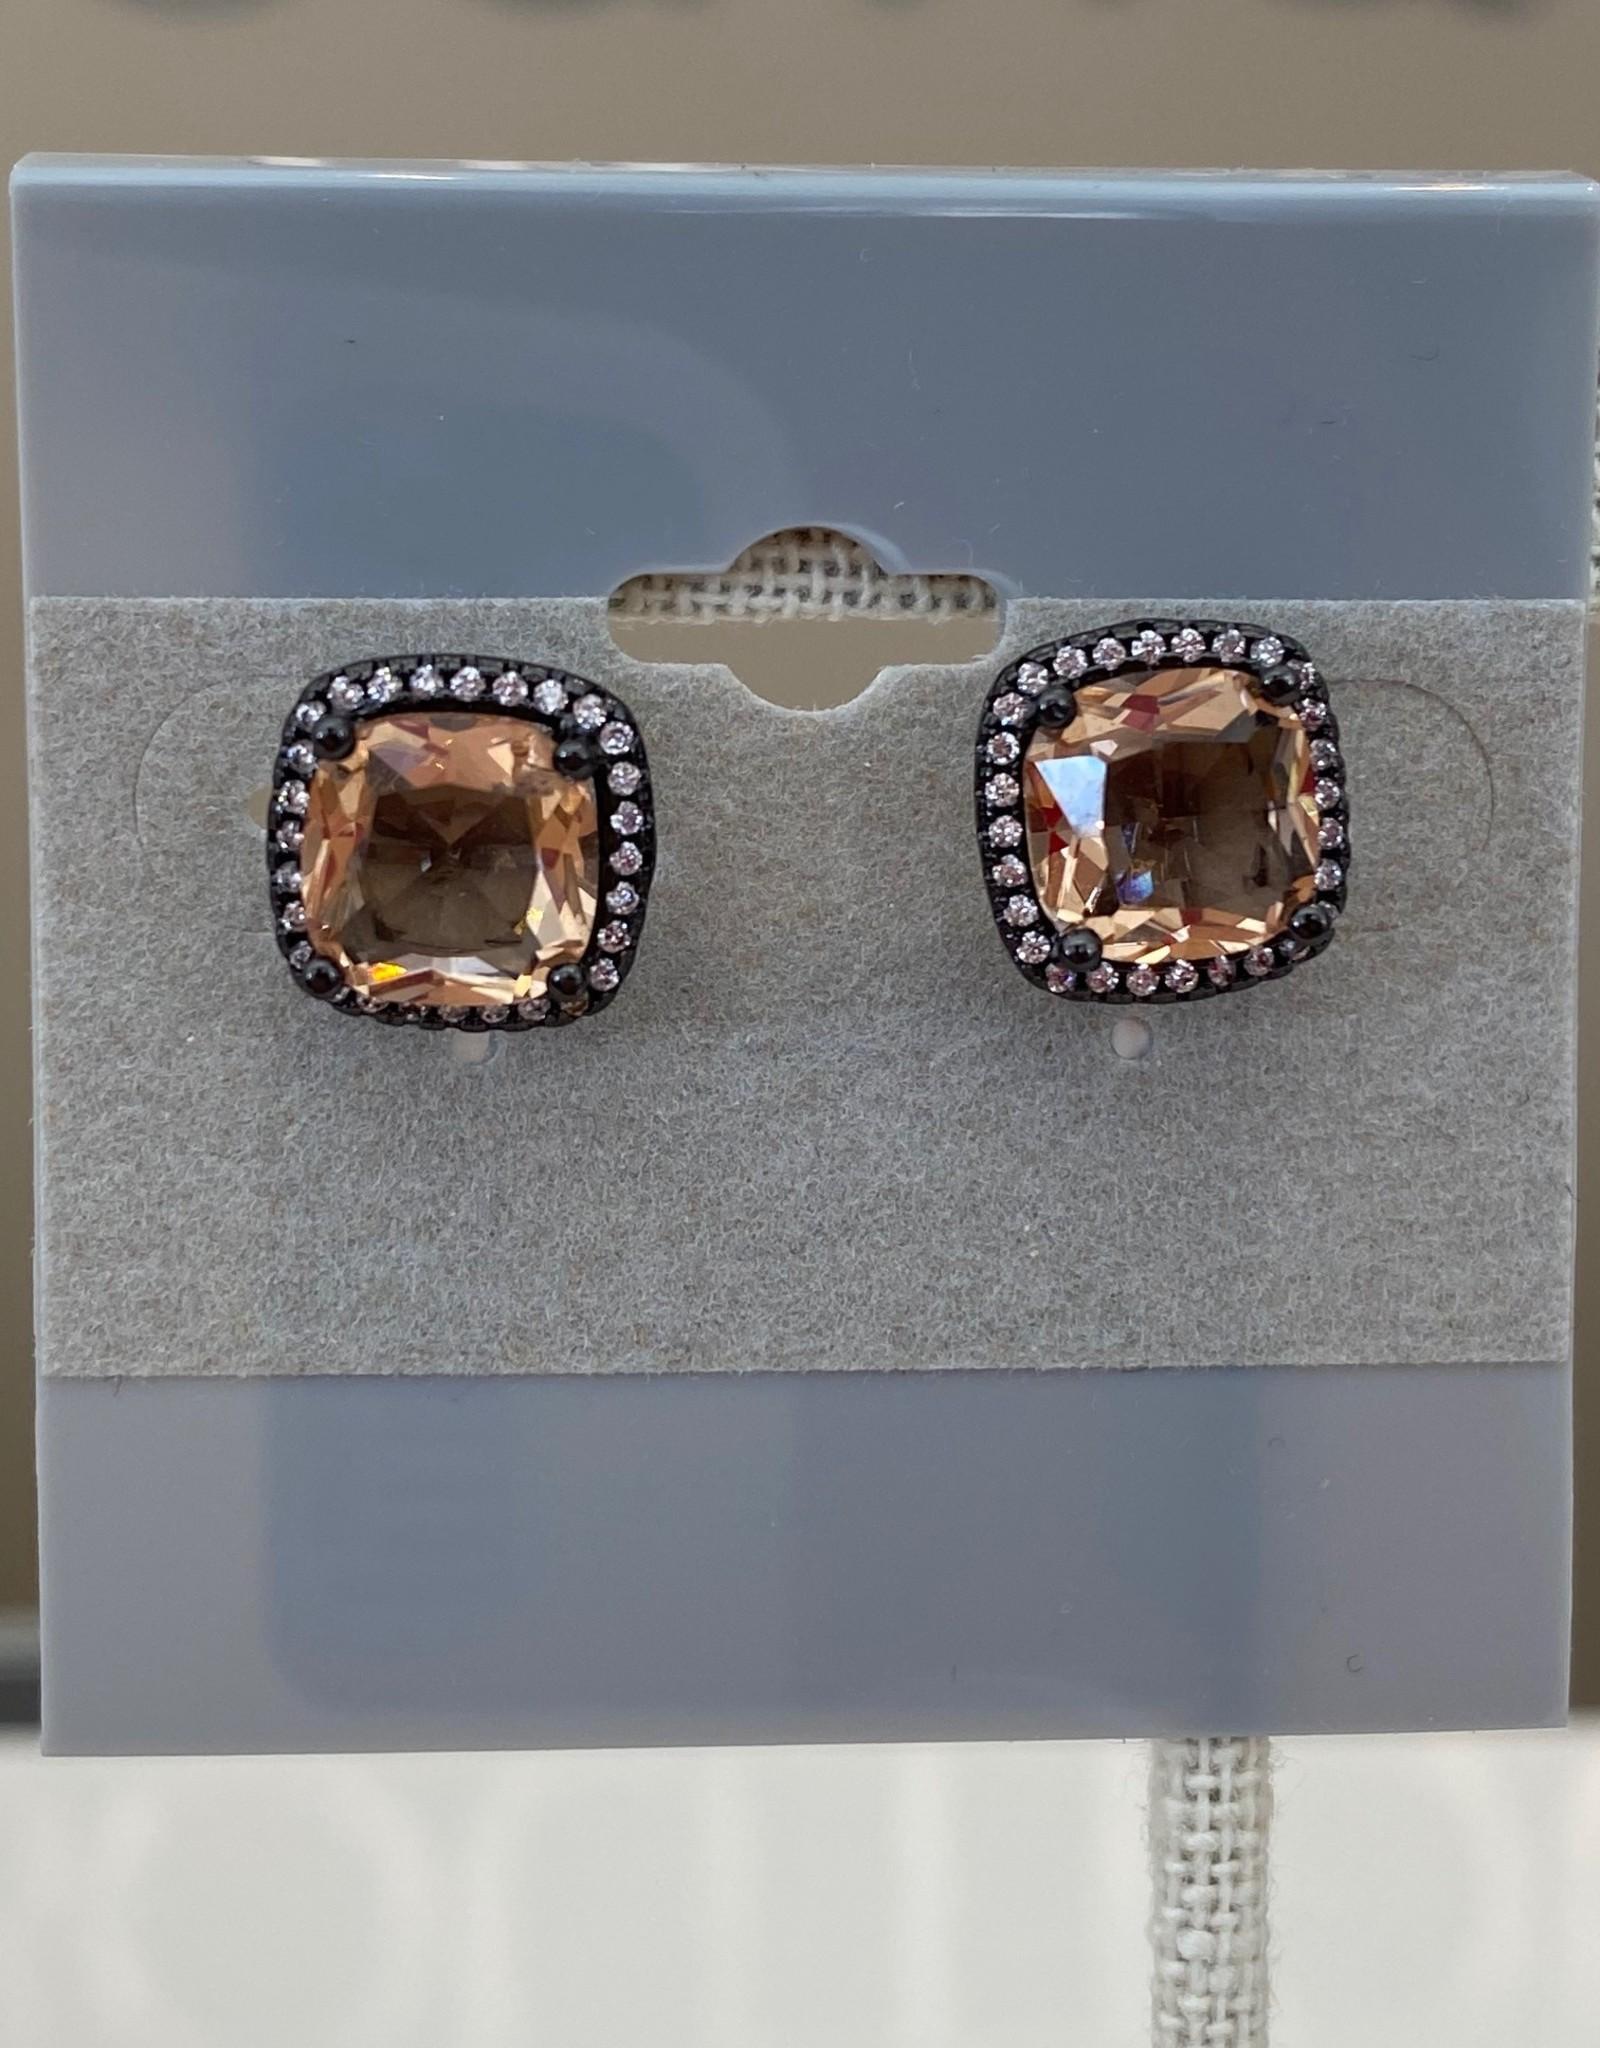 Square Jewel Earring Black/Champagne